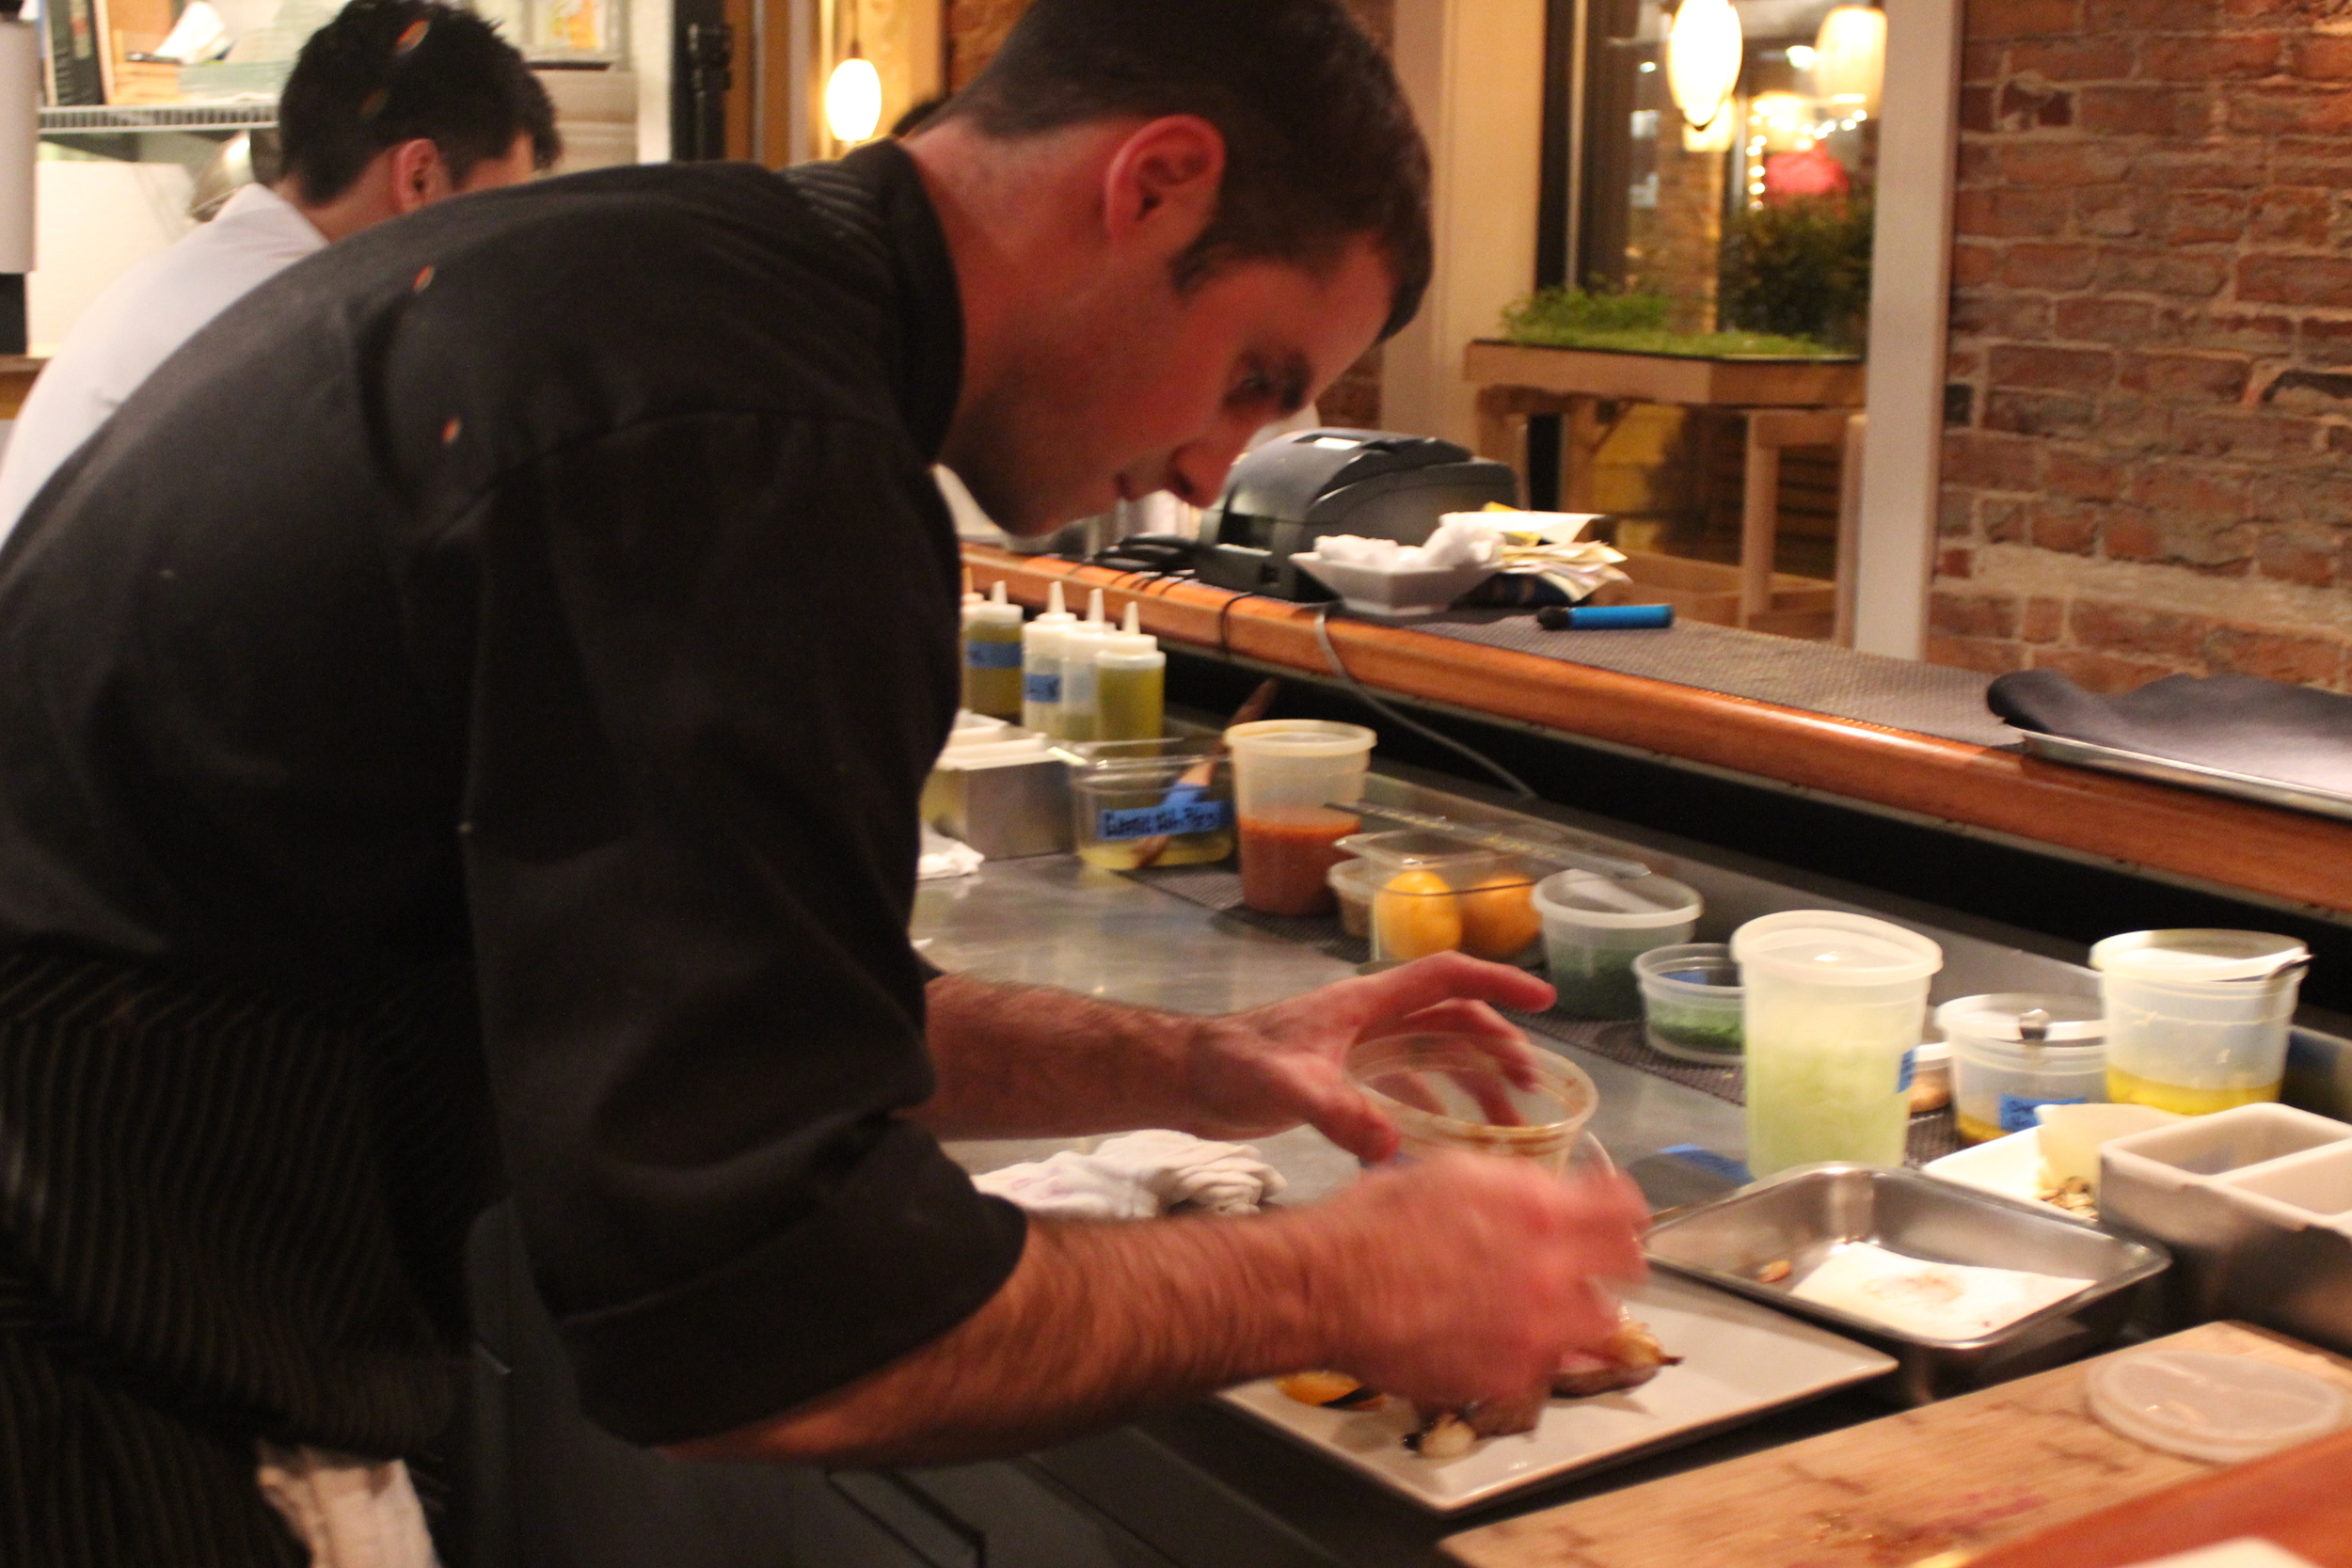 Gregg Sessler, Proprietor and Chef of Cava, prepares the Beef Sirloin